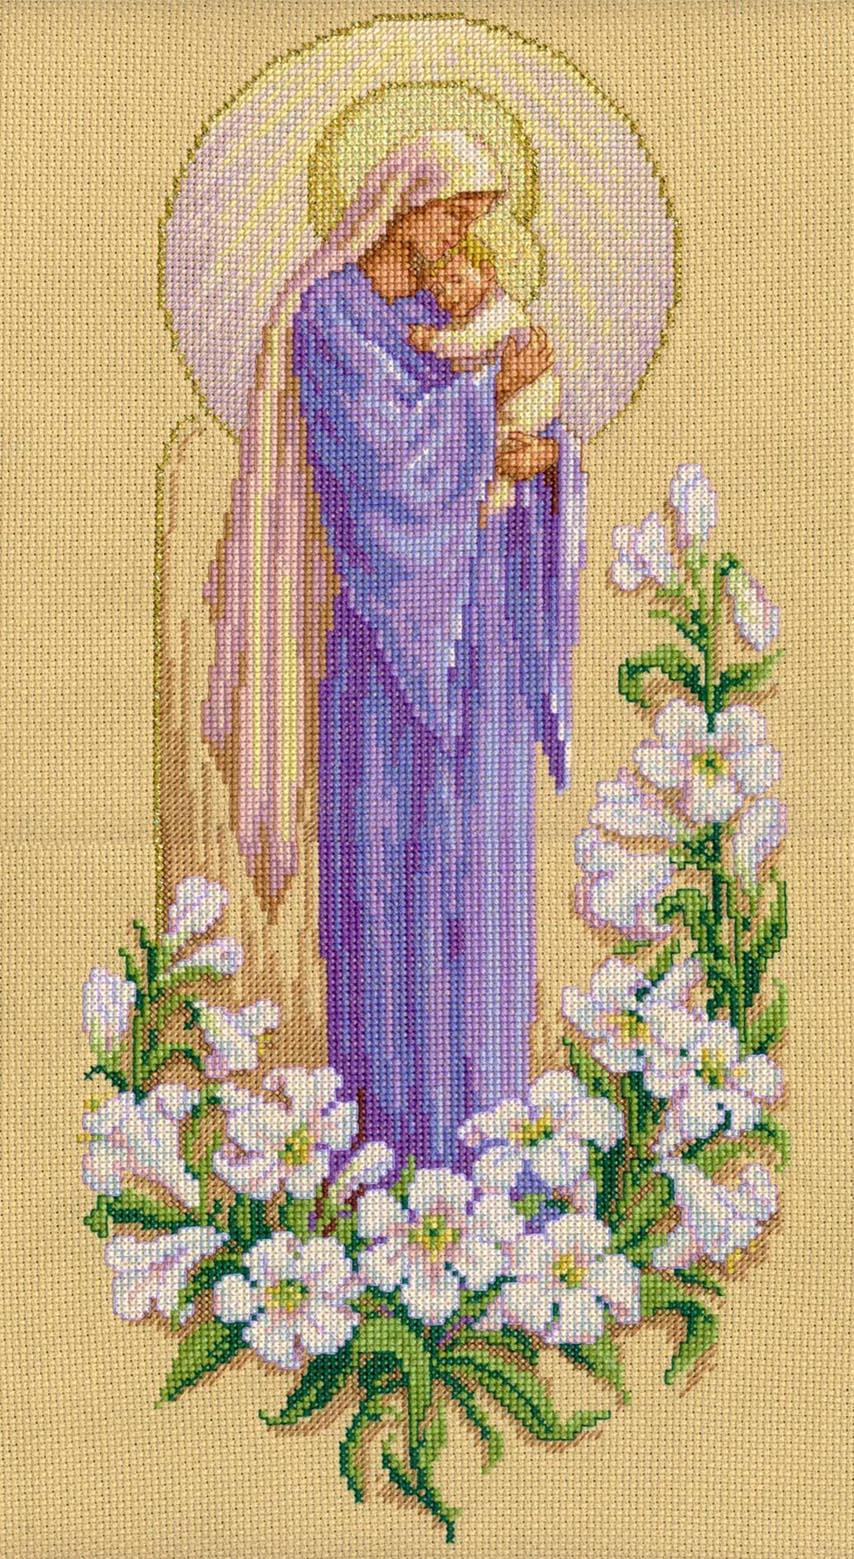 Вышивка крестом богородица с младенцем схема